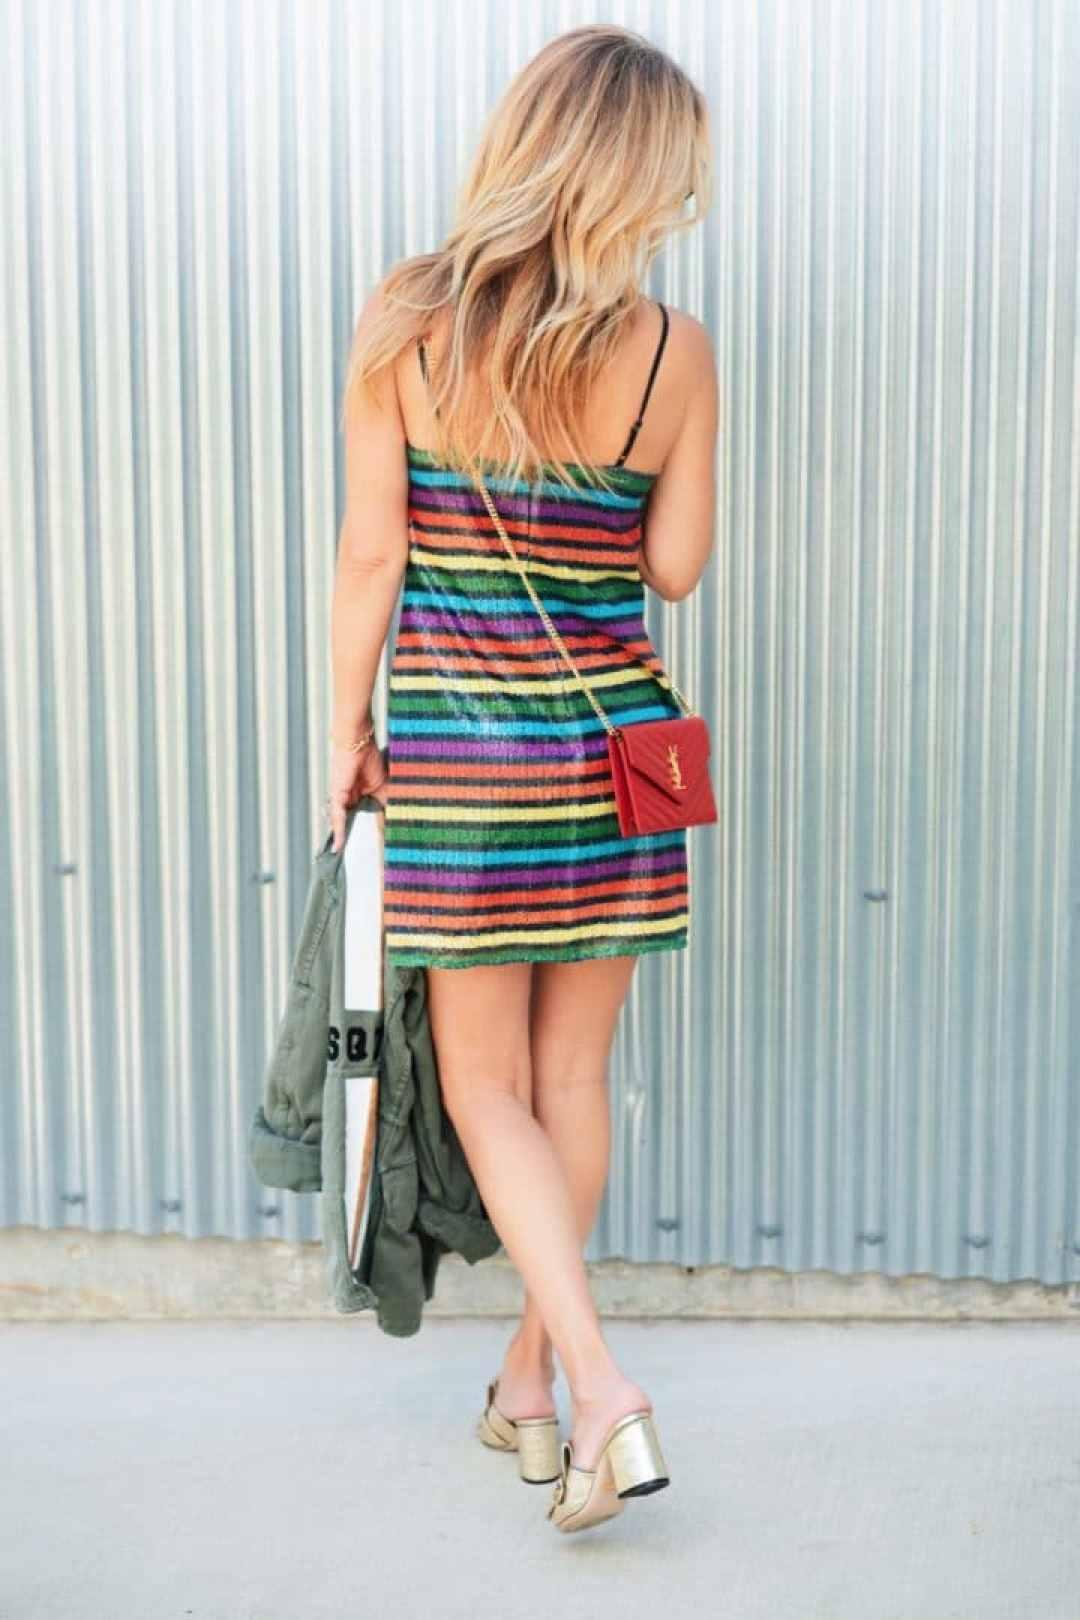 Summer Fashion Rainbow Metallic Slip Dress